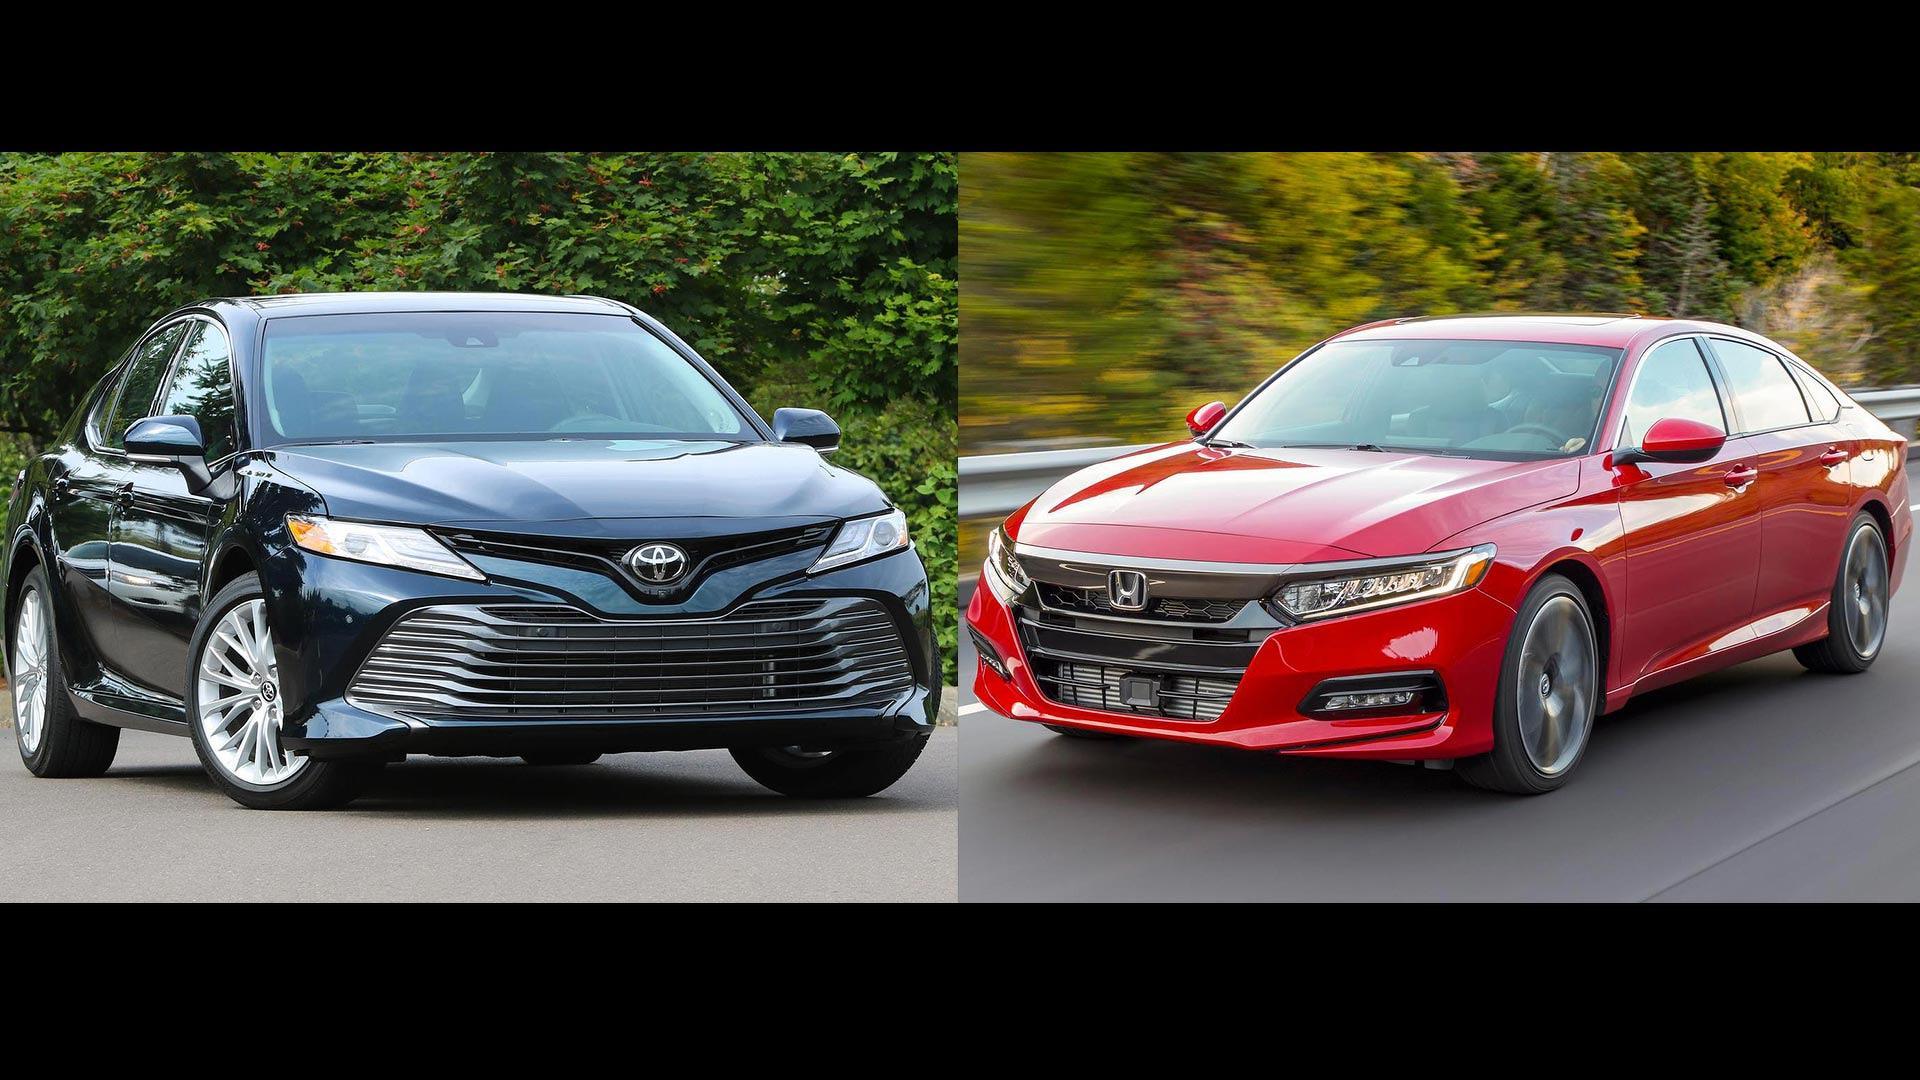 Toyota Honda >> 2018 Honda Accord Vs 2018 Toyota Camry The Family Sedan Battle